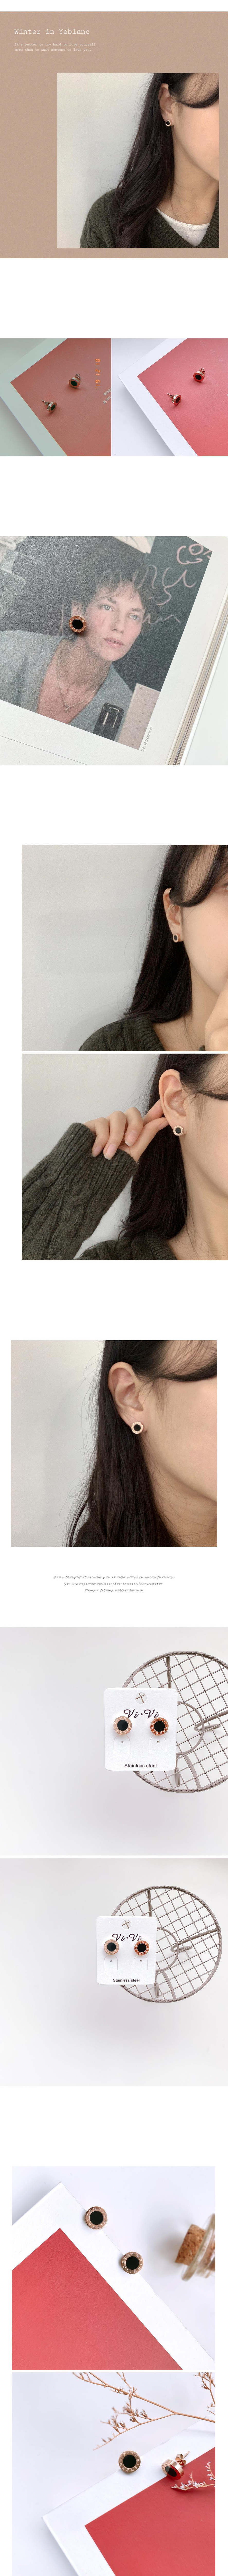 Bvlgari St Roman Circle Daily Earrings A#YW001